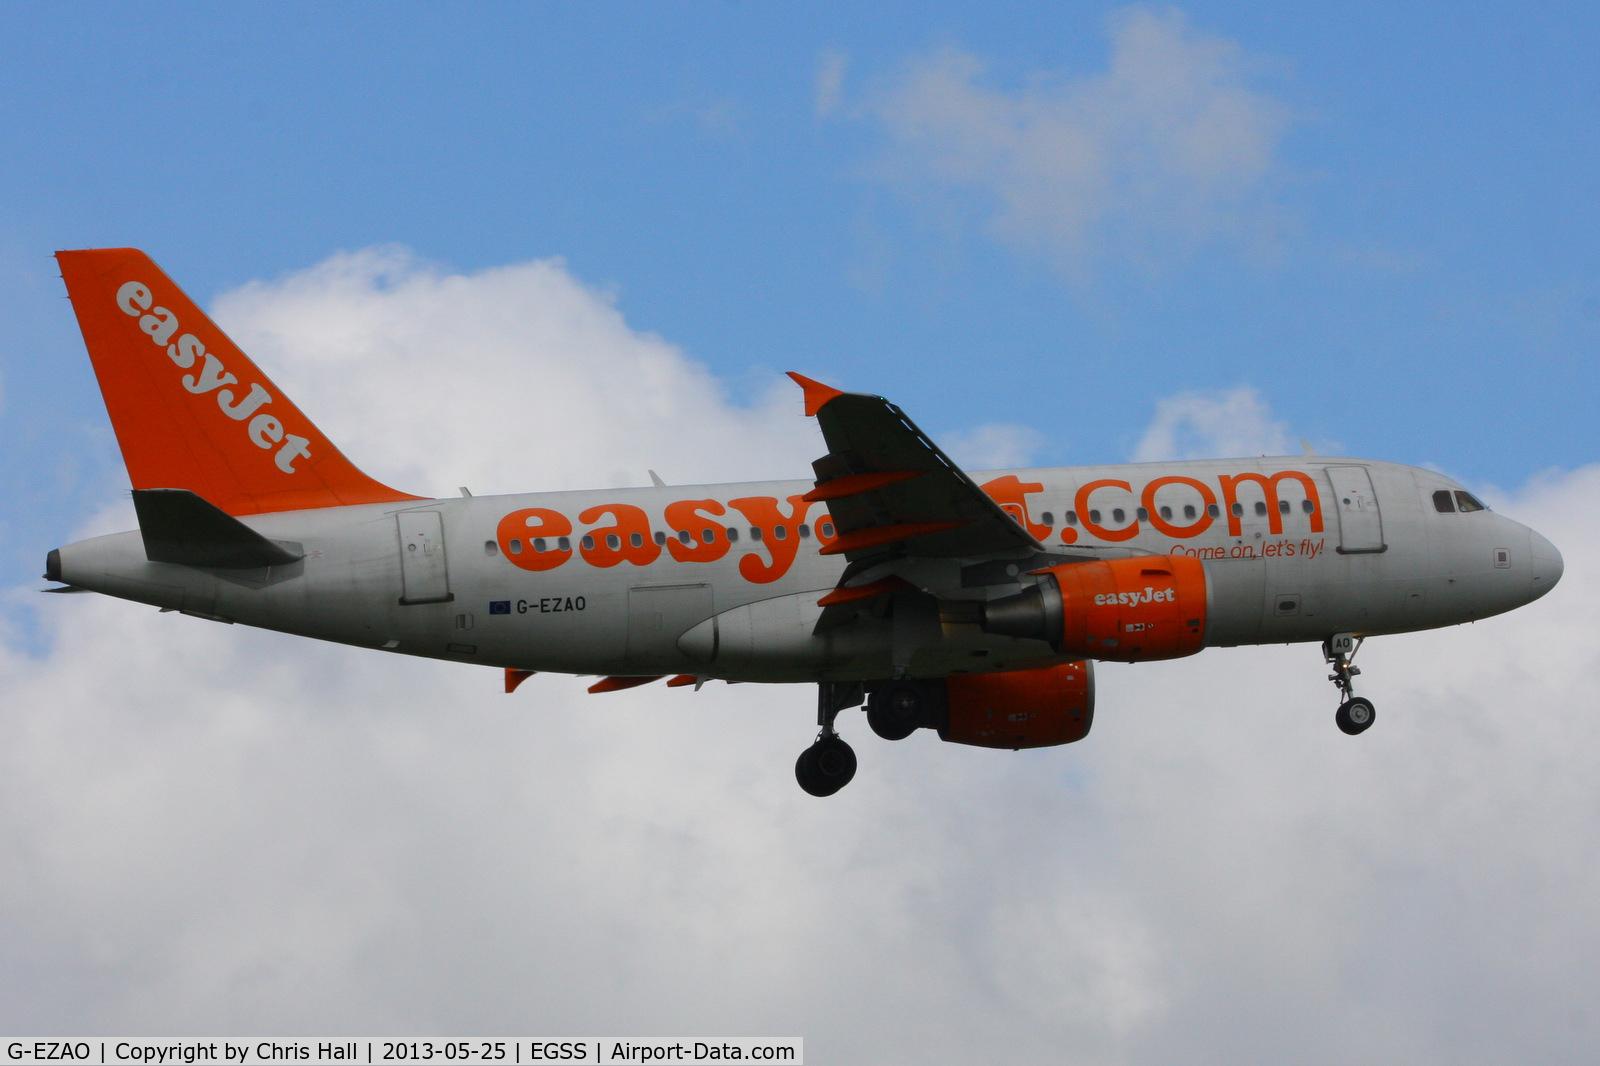 G-EZAO, 2006 Airbus A319-111 C/N 2769, easyJet